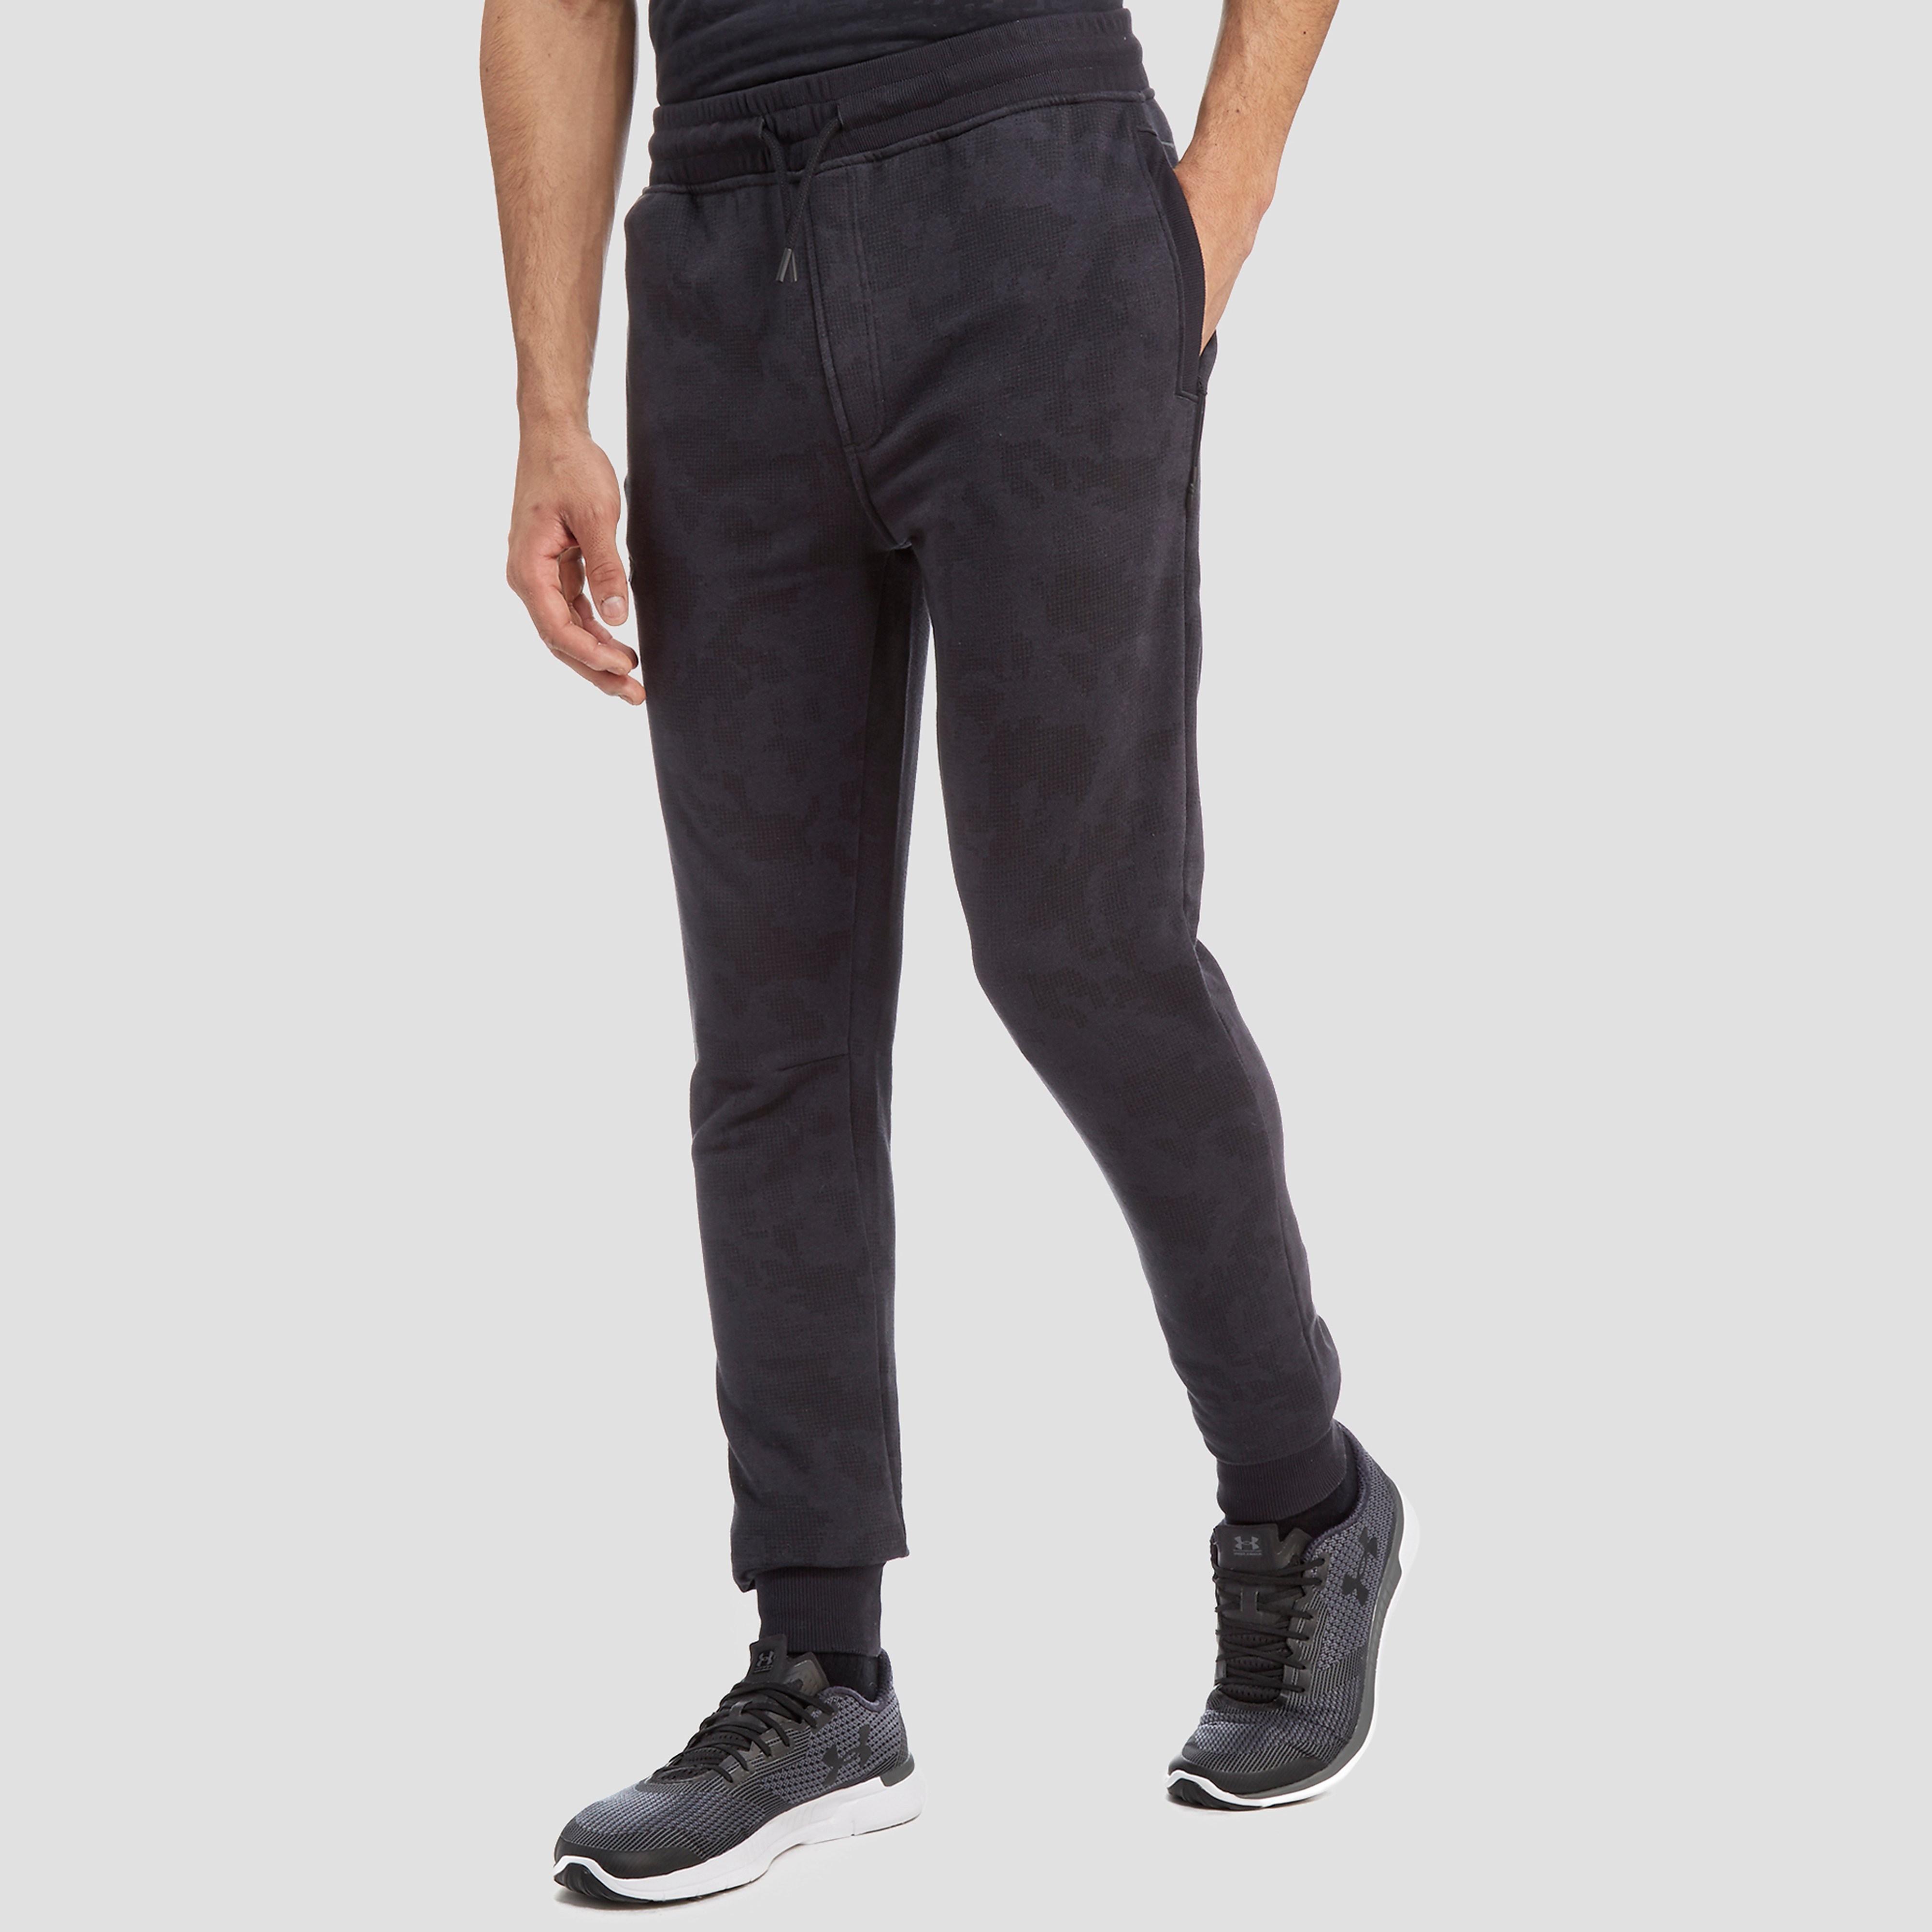 Under Armour Men's Threadborne Pants